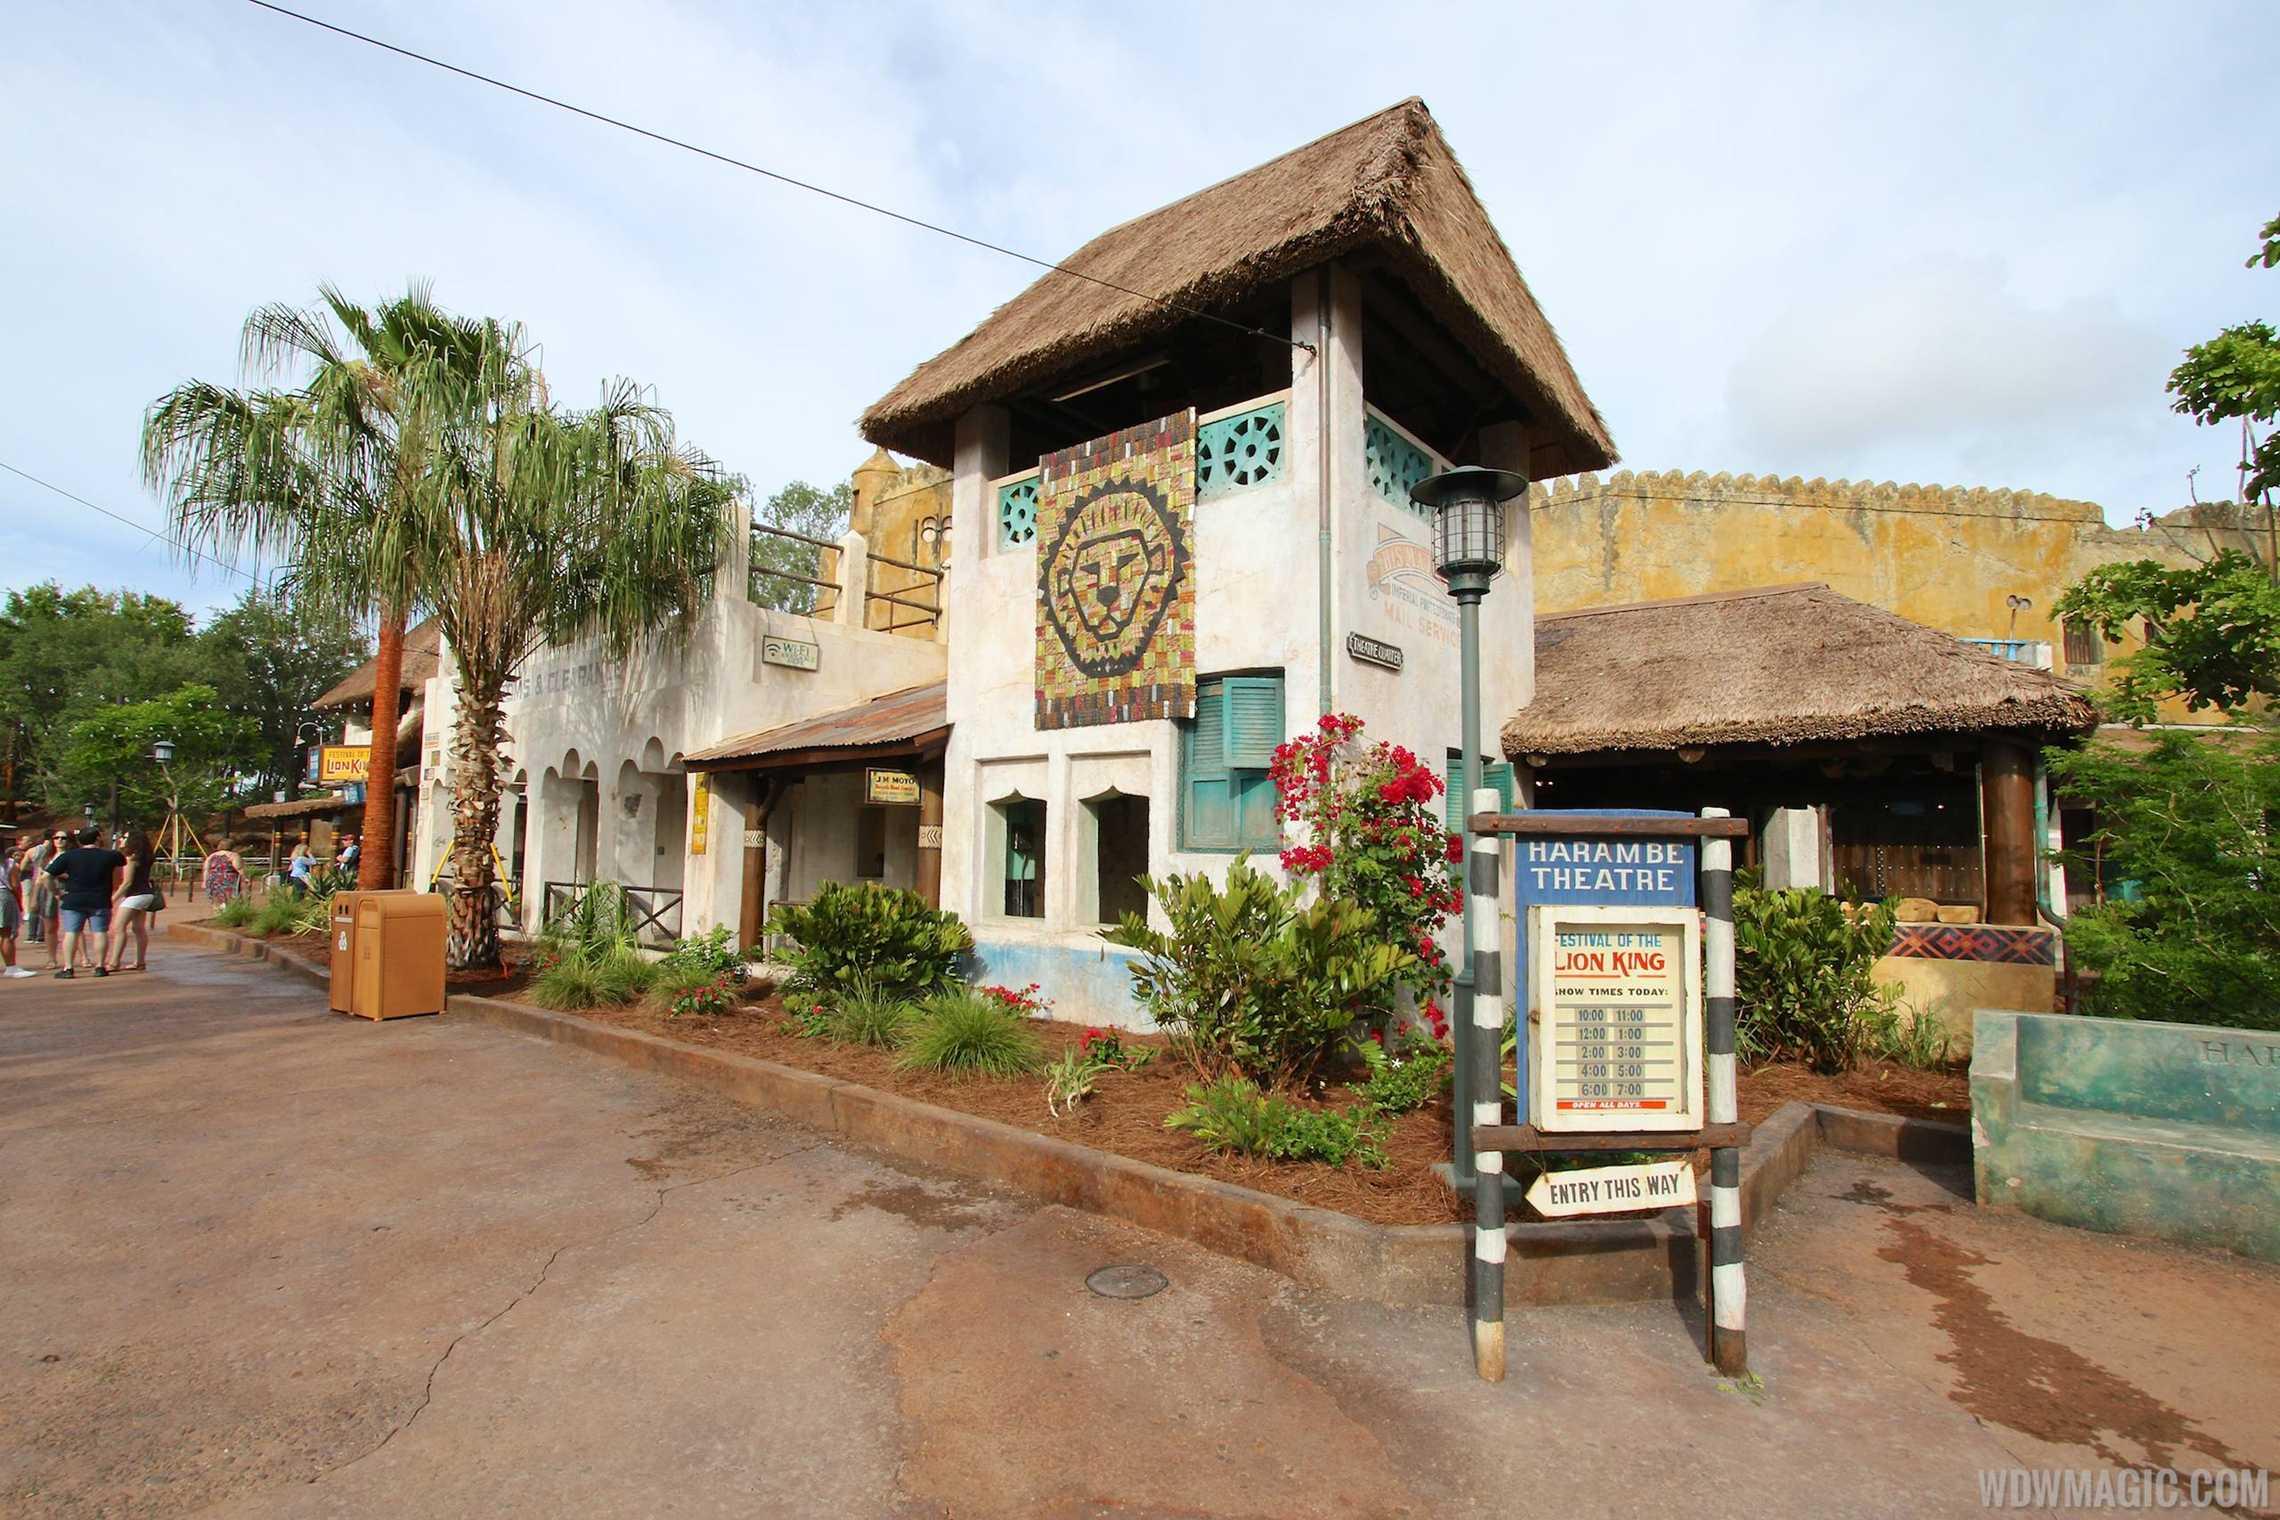 New Harambe Theatre area in Africa - The Harambe Theatre